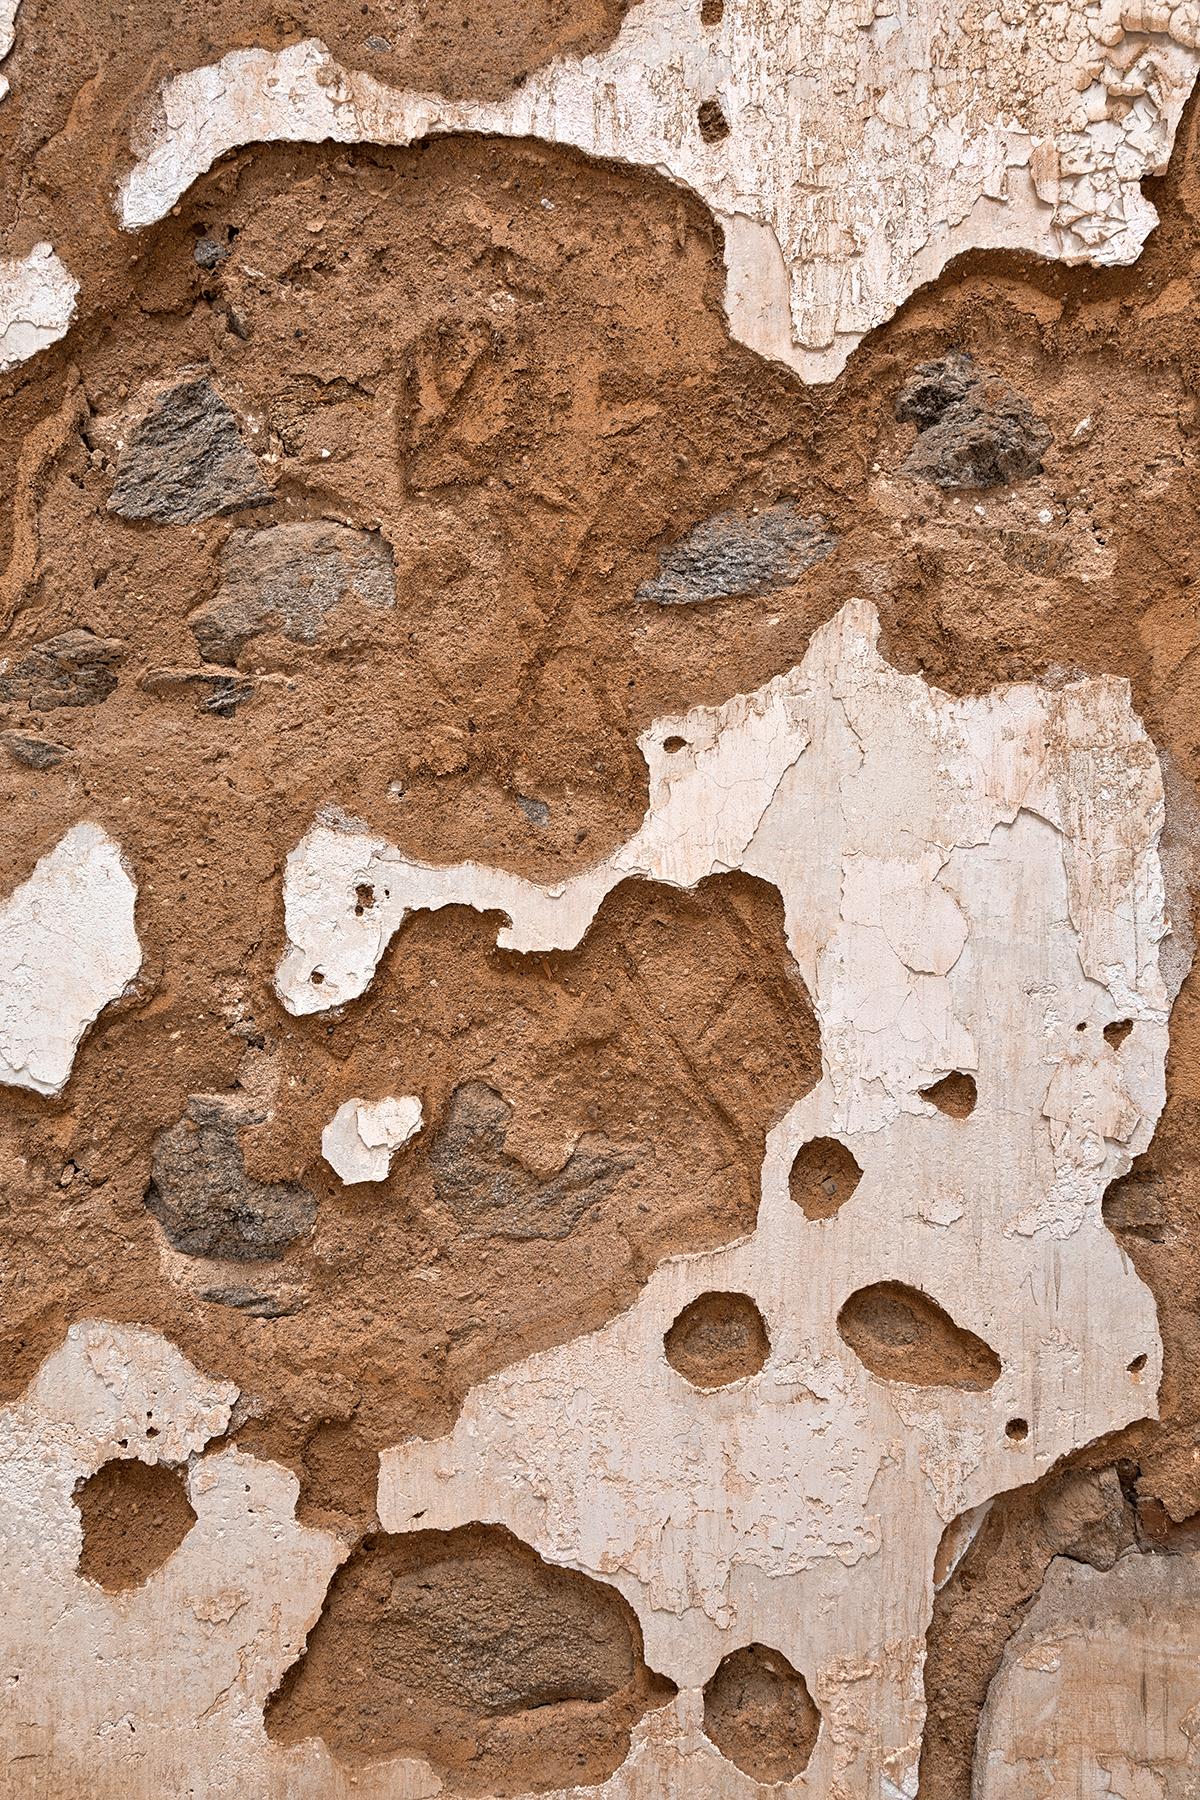 Grunge Wall - HDR Texture, Backdrop, Maroon, Peeling, Peeled, HQ Photo